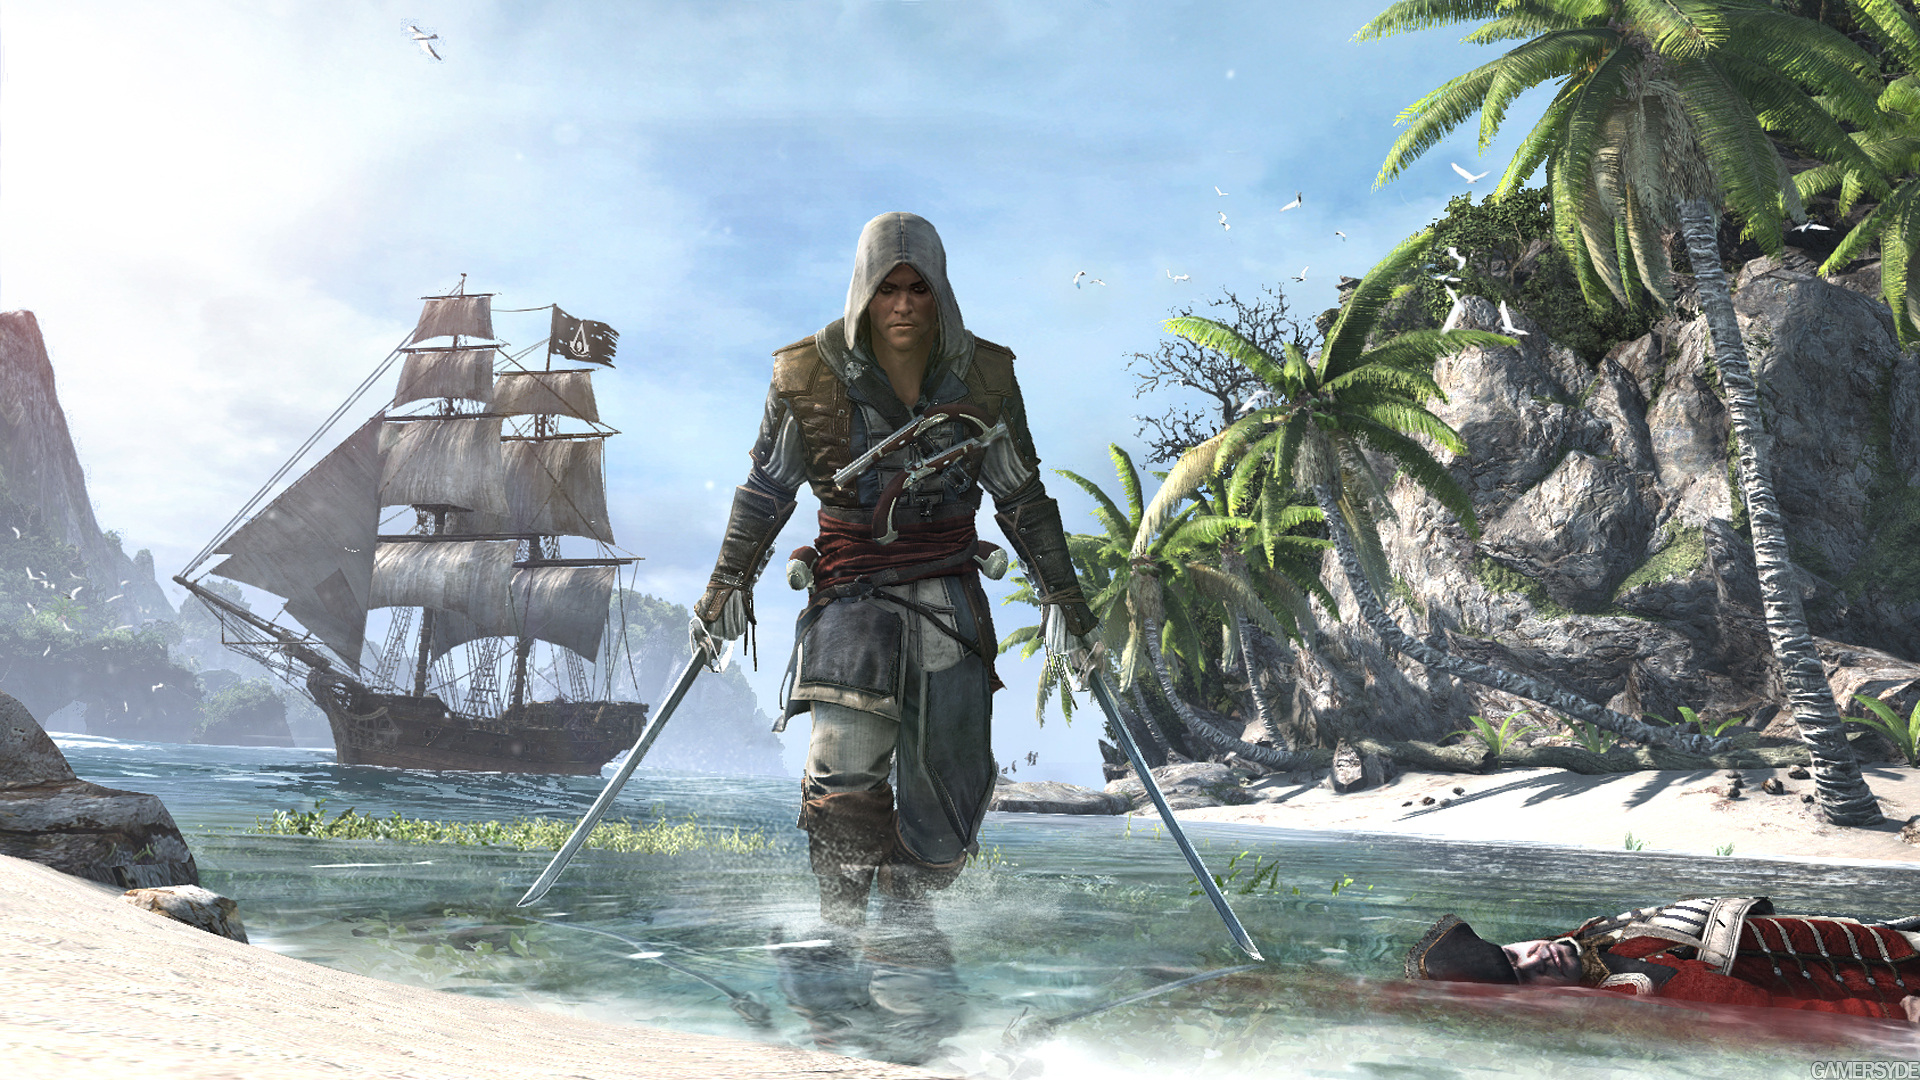 image assassin s creed iv black flag 21549 2670 0001 برخاسته از میان دزدان دریایی / اولین نگاه به Assassins Creed 4: Black Flag